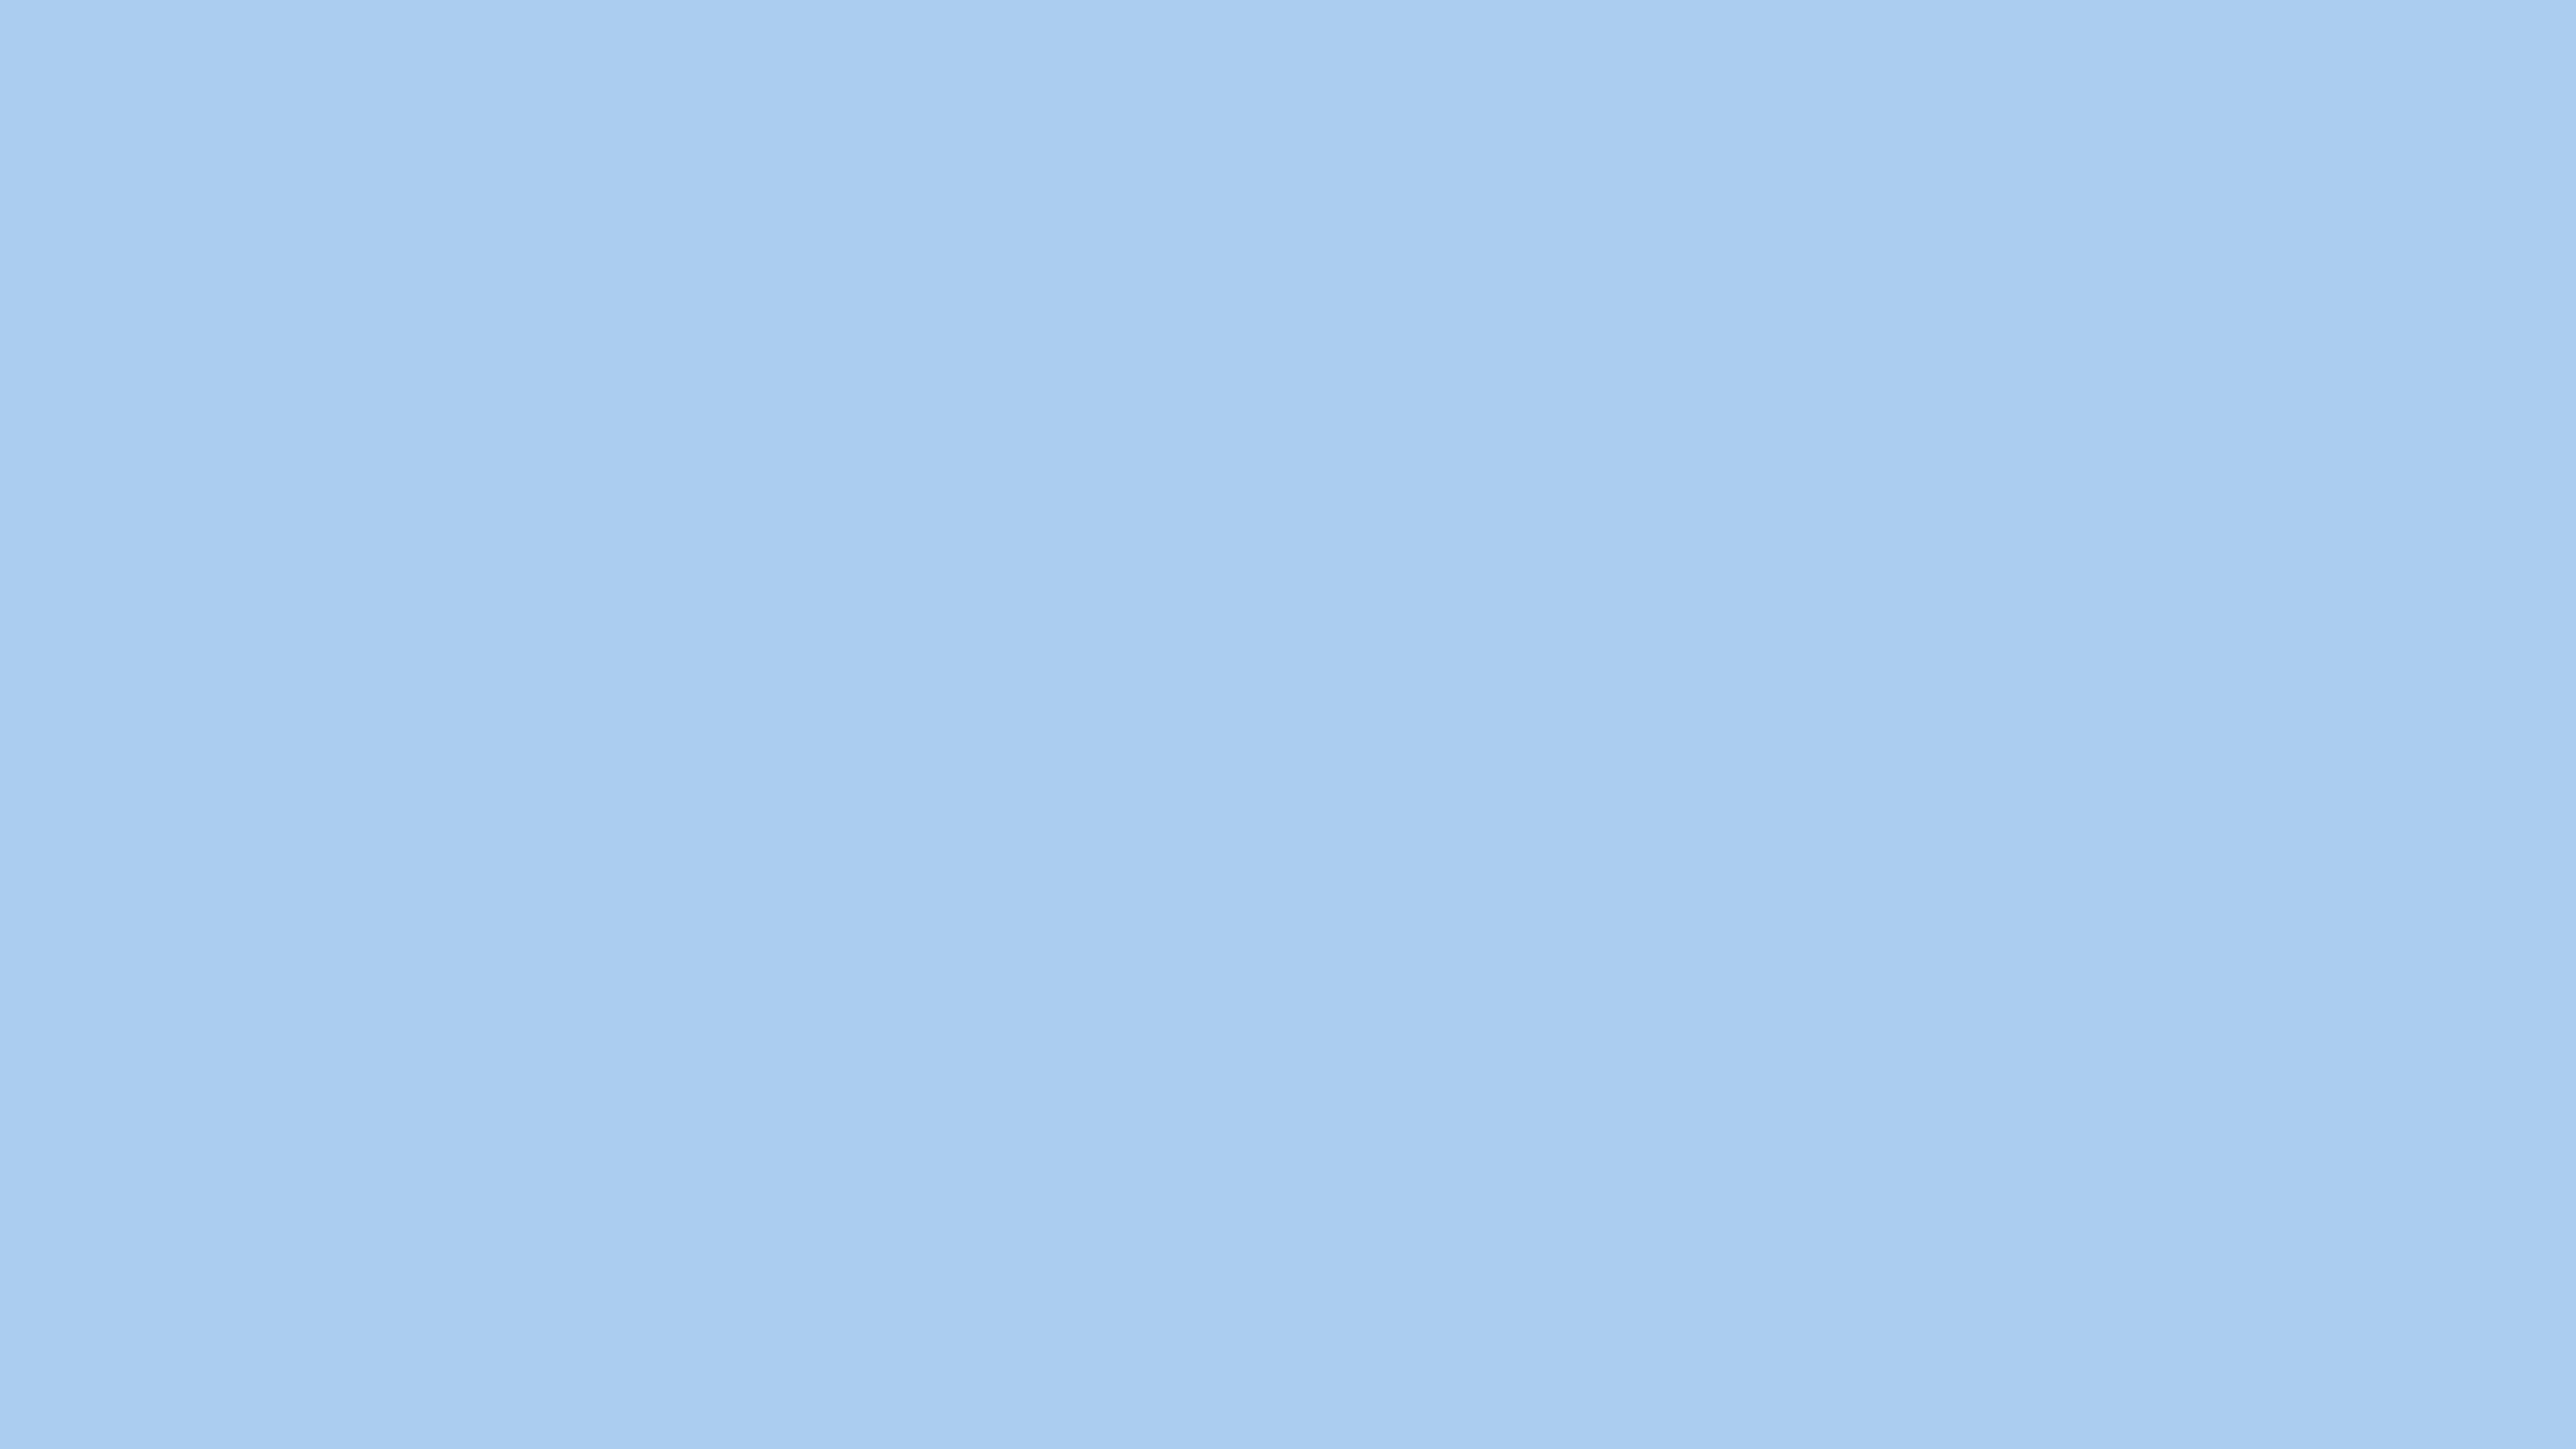 4096x2304 Pale Cornflower Blue Solid Color Background